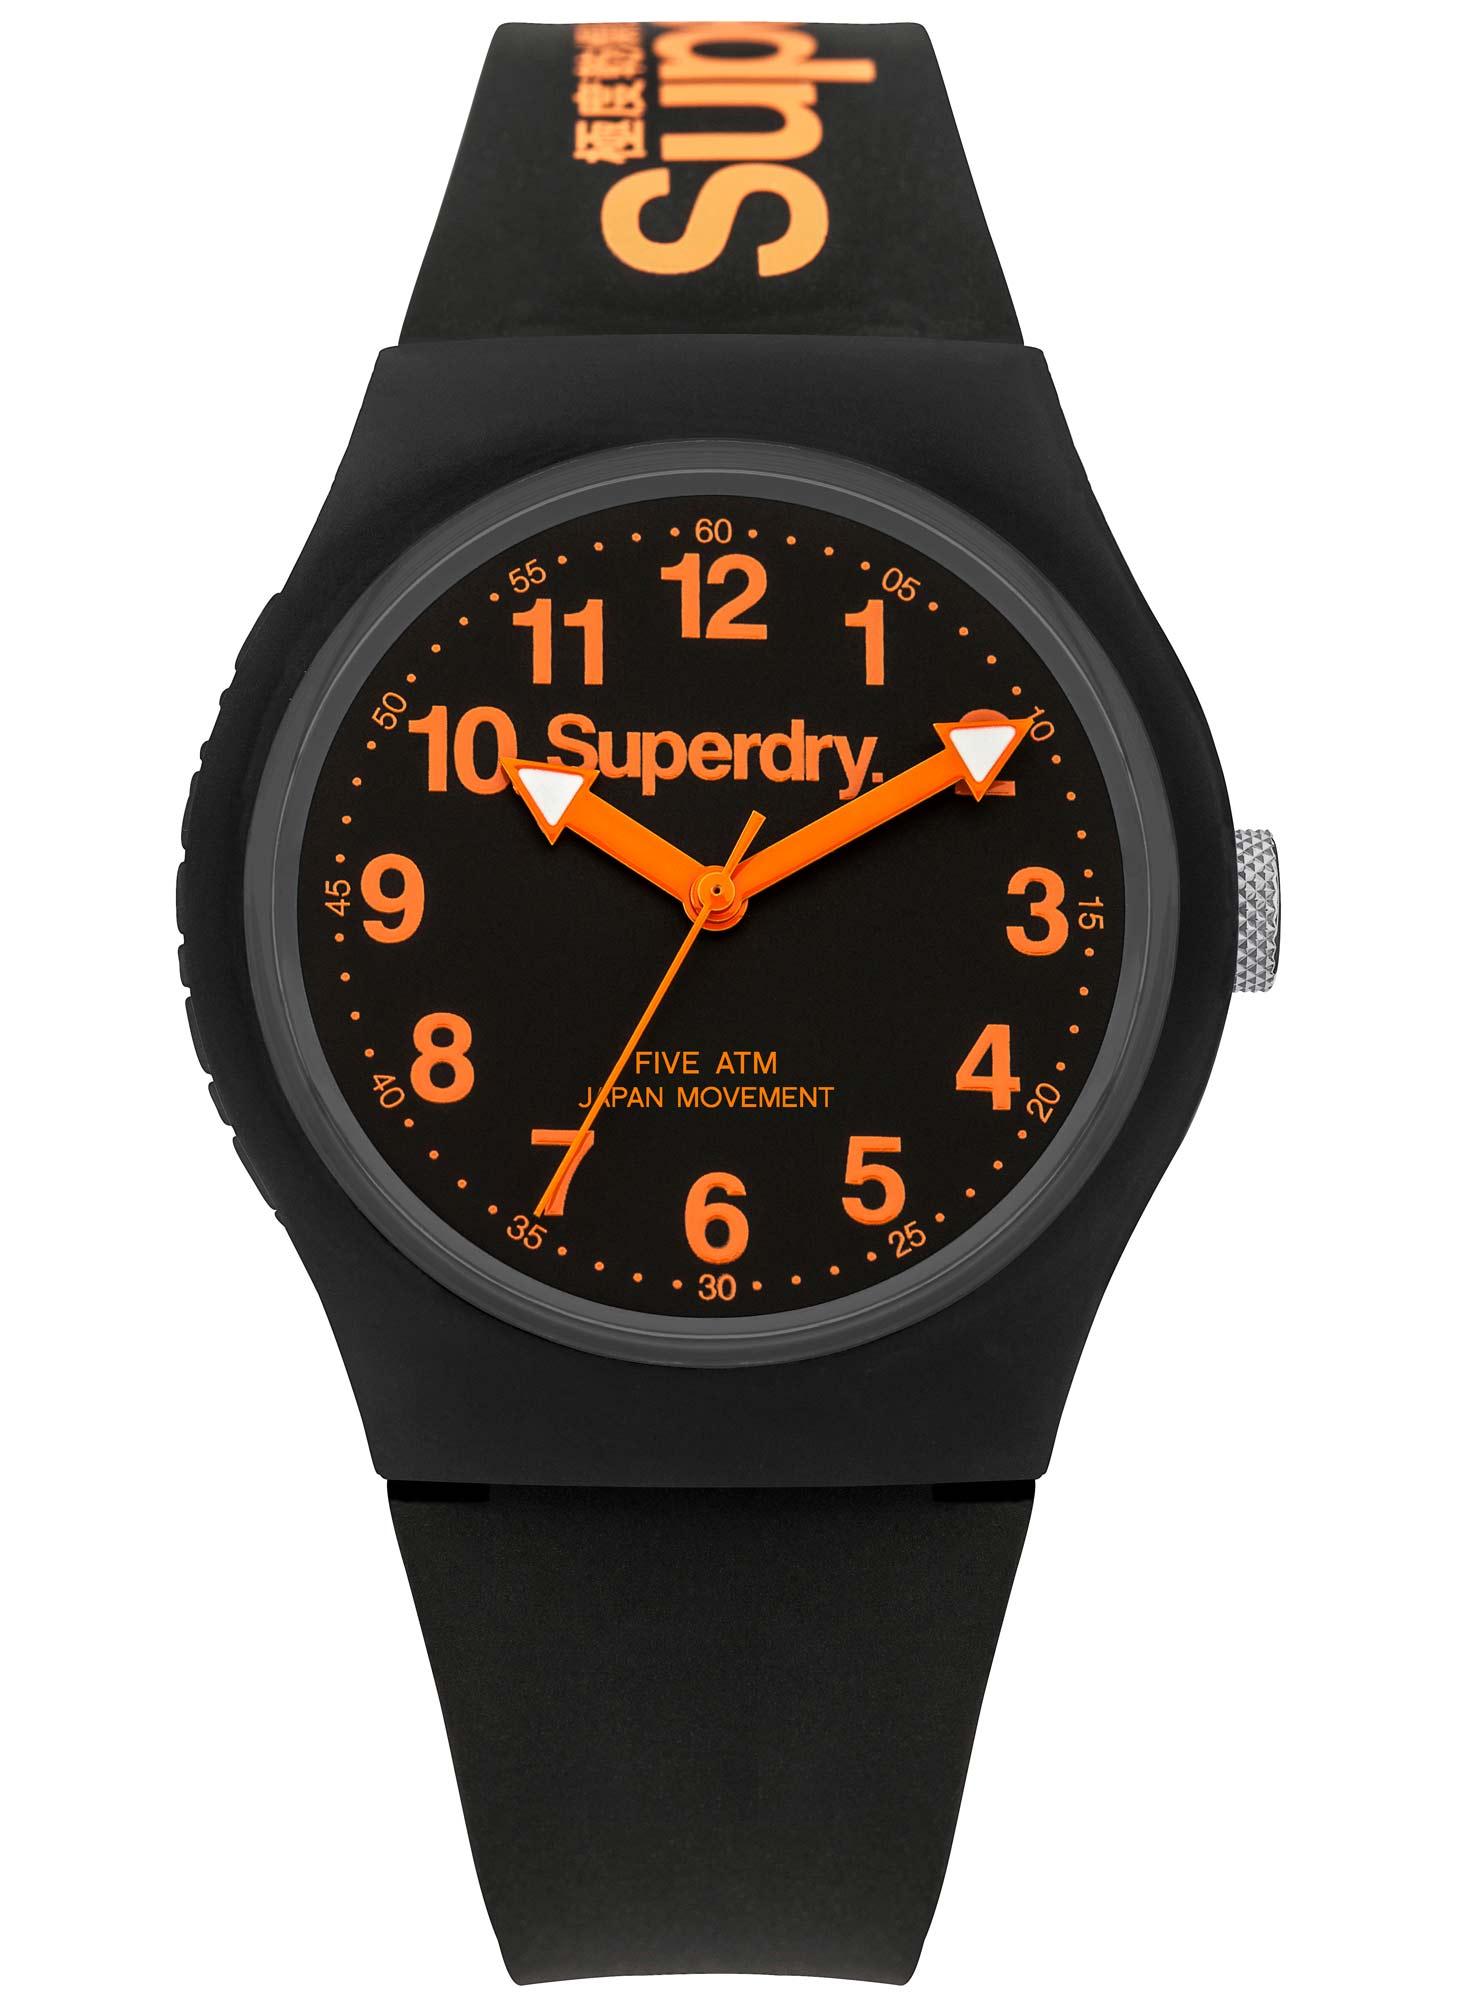 superdry_watches_SDSYG164B.jpg